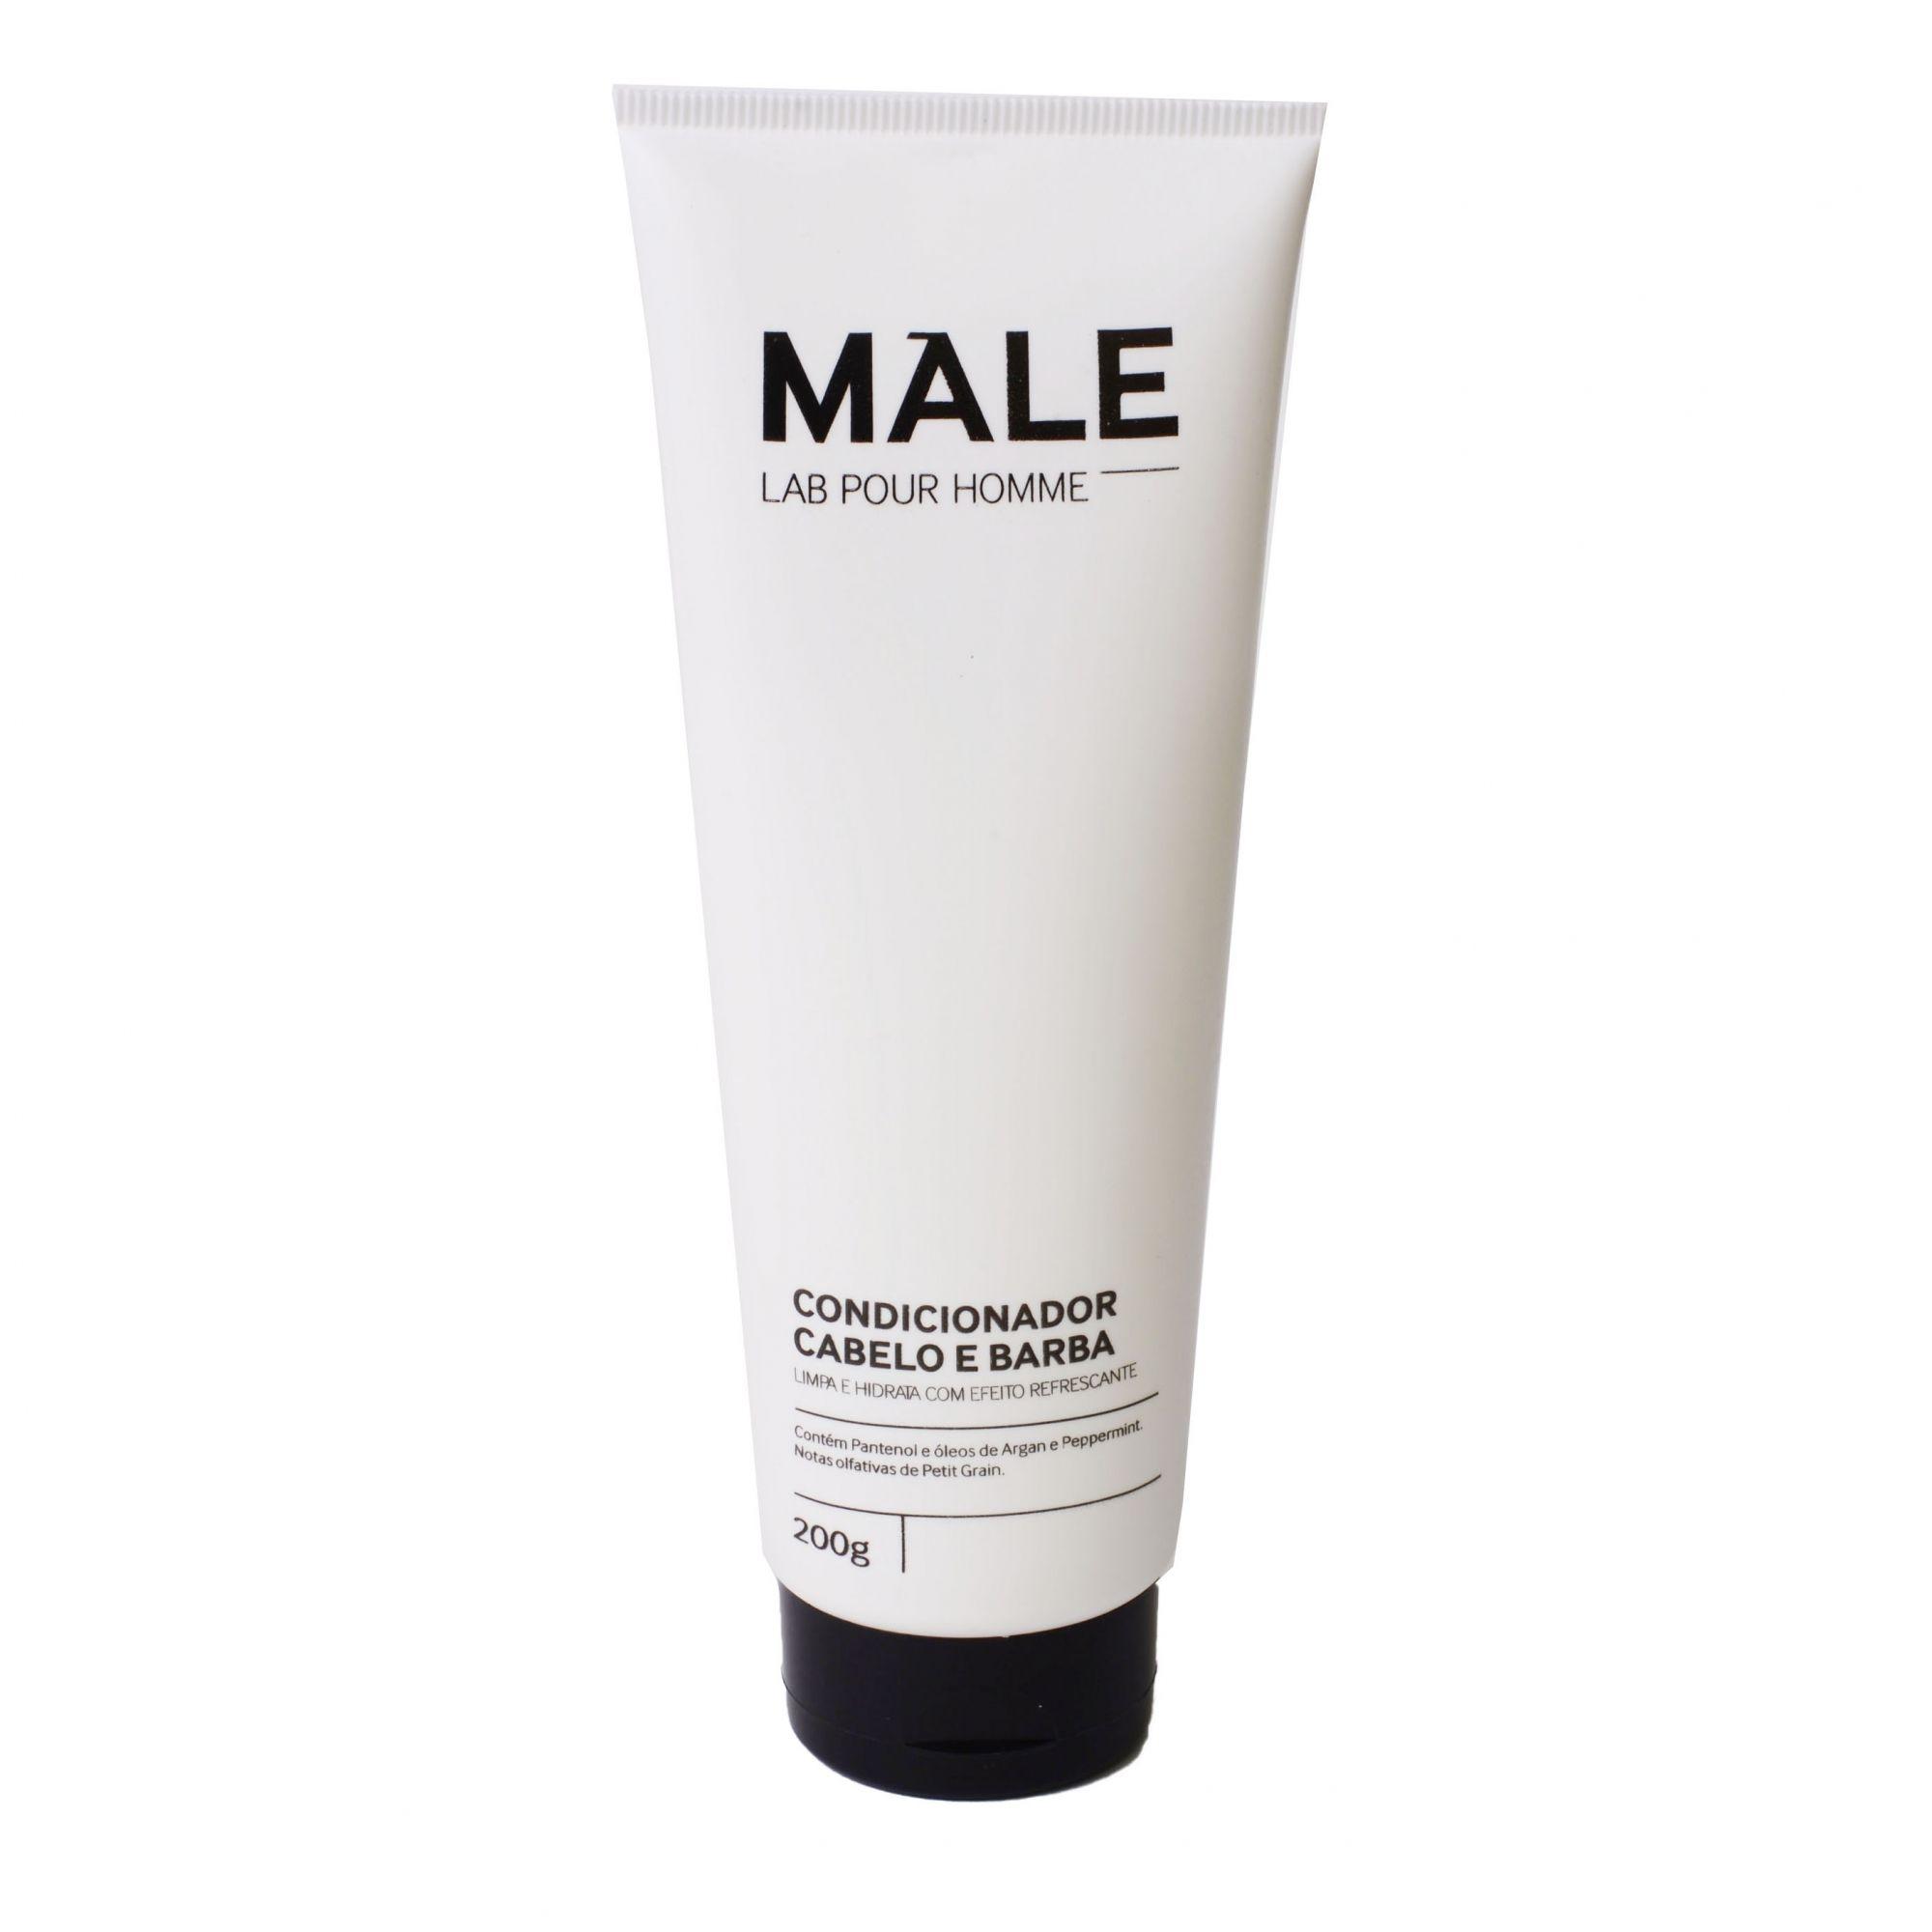 Condicionador Cabelo e Barba   Male Lab Pour Homme